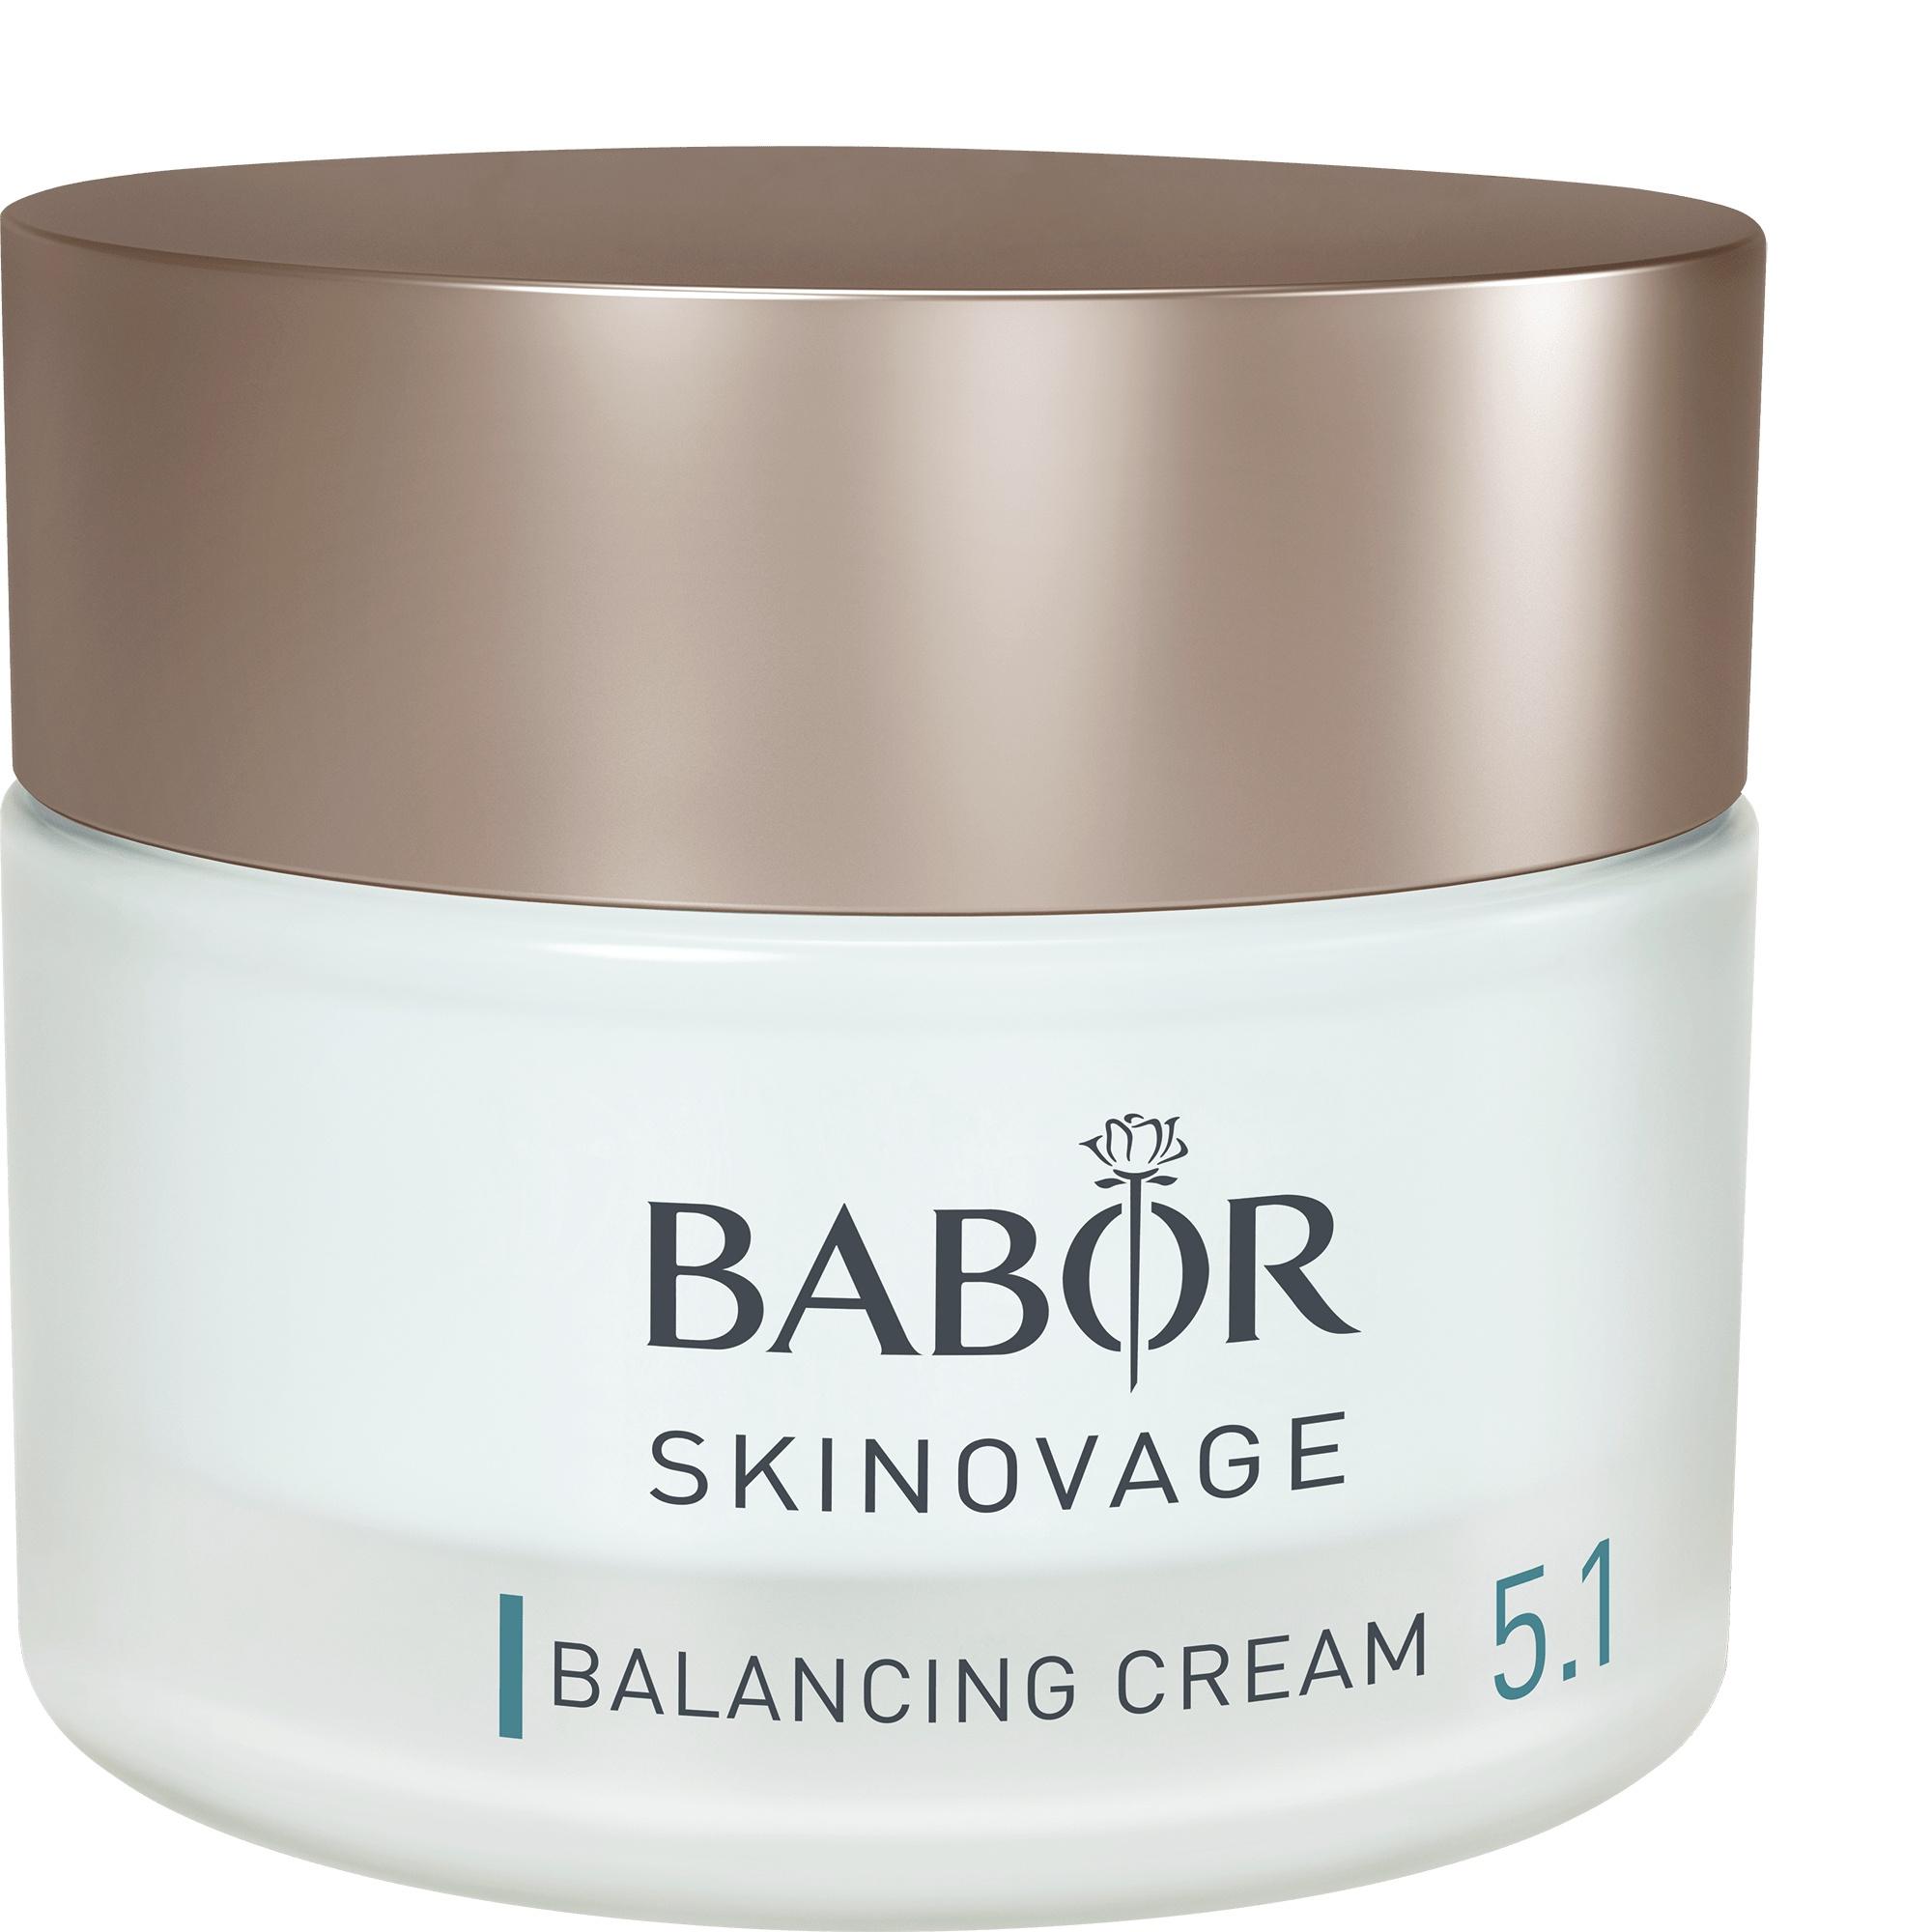 Skinovage Balancing Cream 50ml